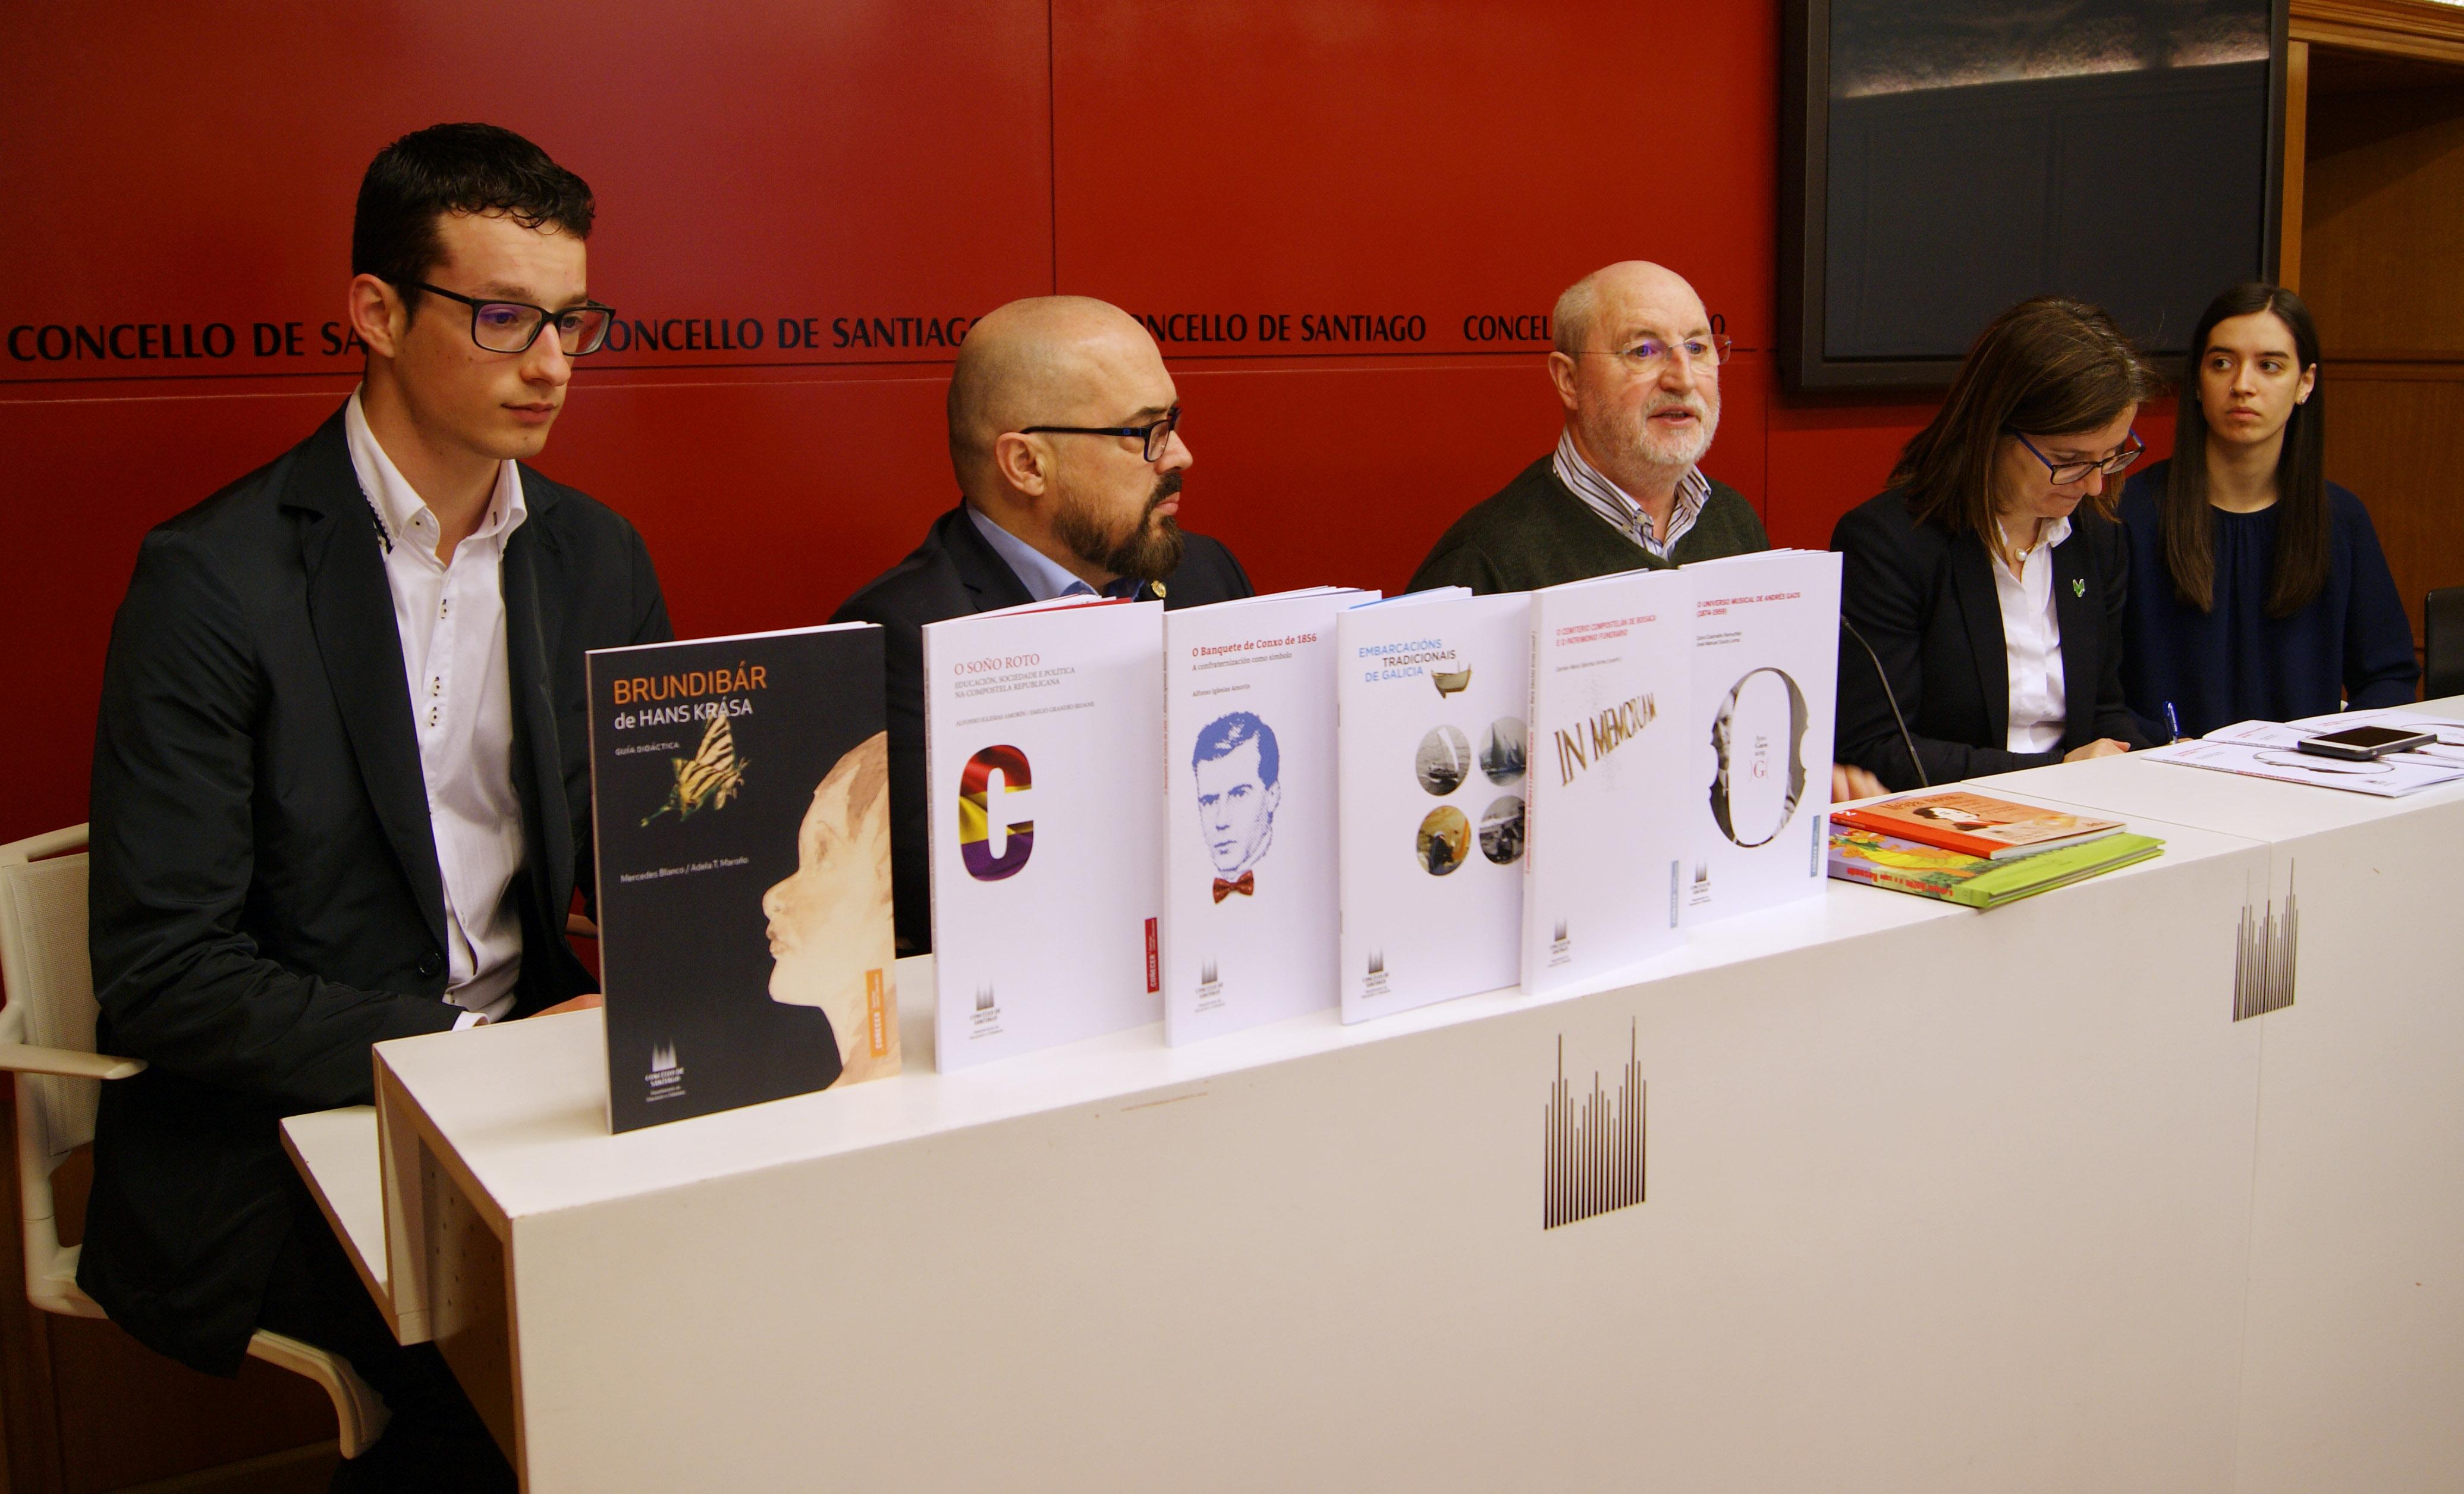 José Manuel Souto, Javier Garbayo, Manuel Dios, Mar Lorenzo e Zaira Caamaño durante a rolda.